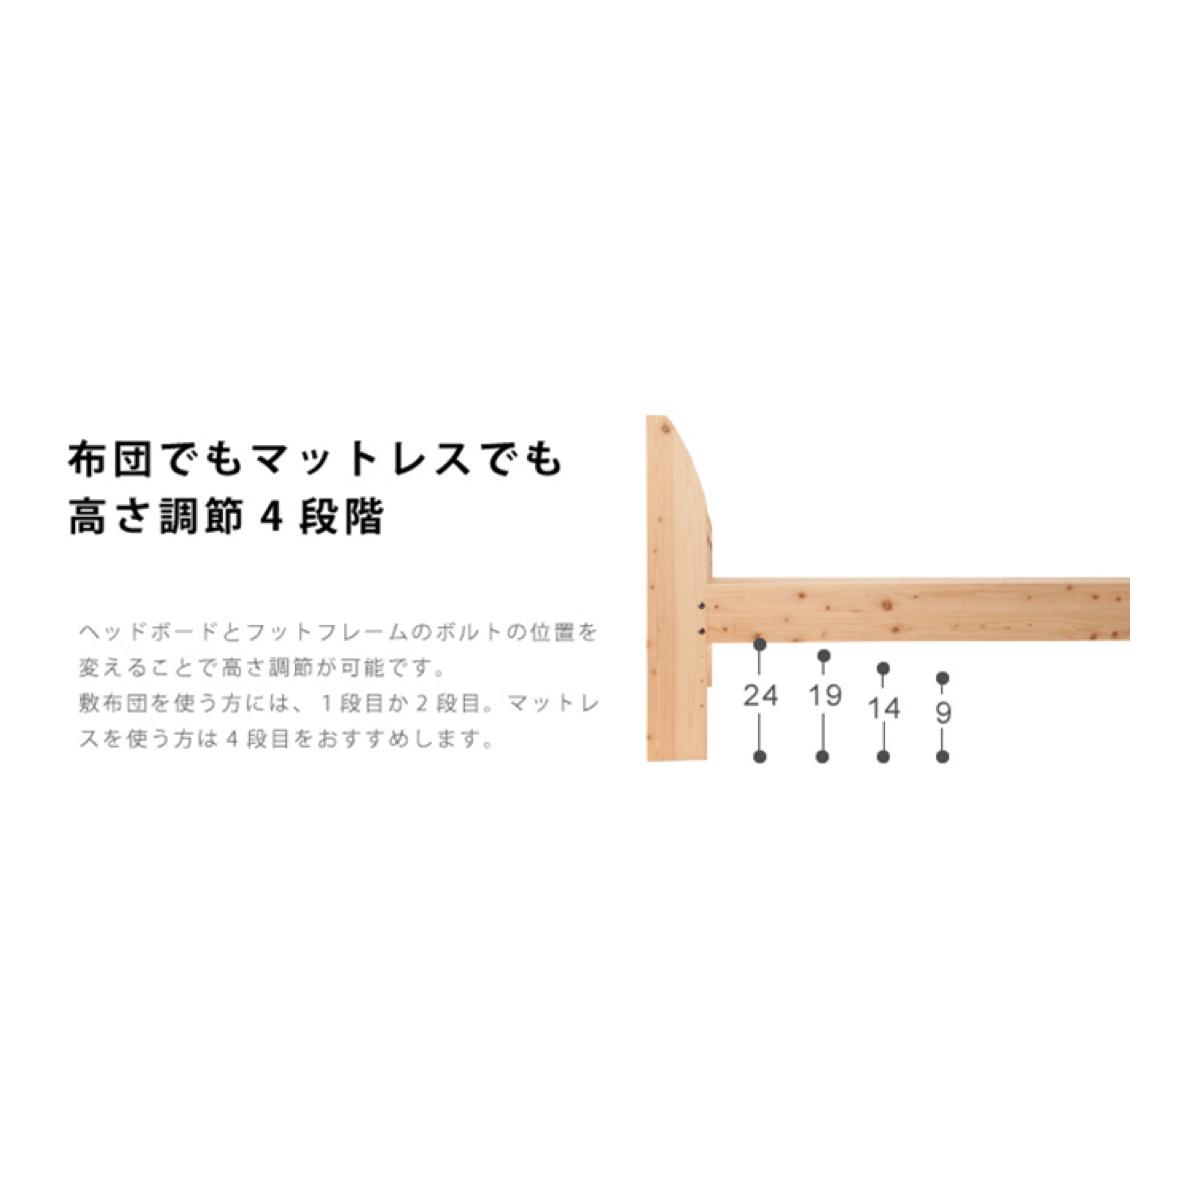 TCB233 ヒノキ SDフレーム3